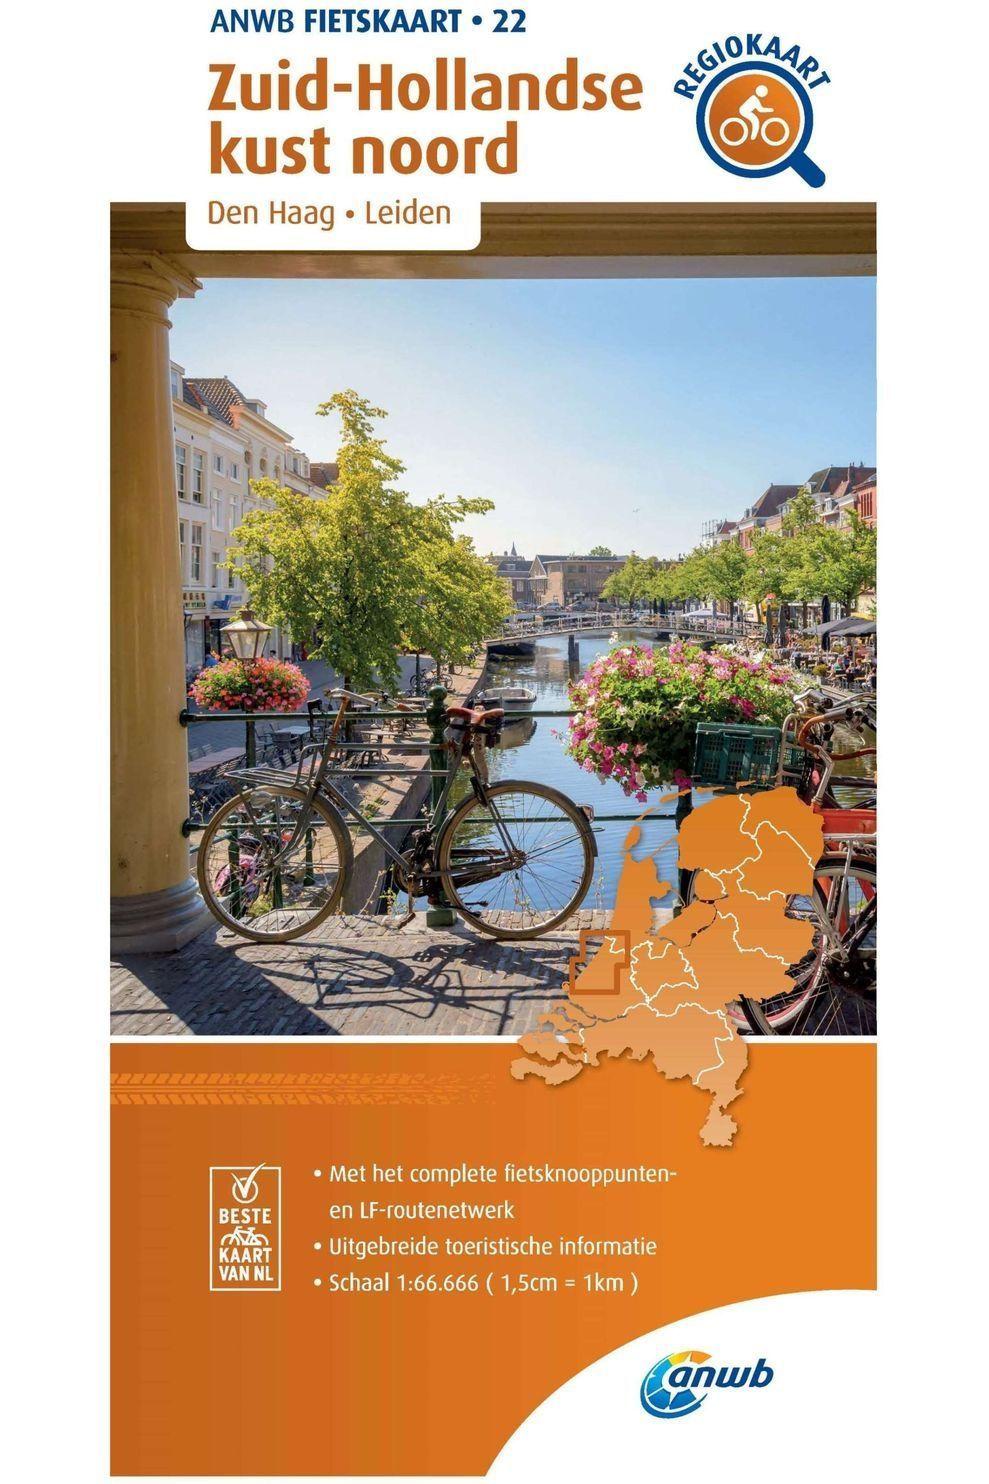 ANWB Zuid-Hollandse Kust Noord 22 Fietskaart R/V - 2020